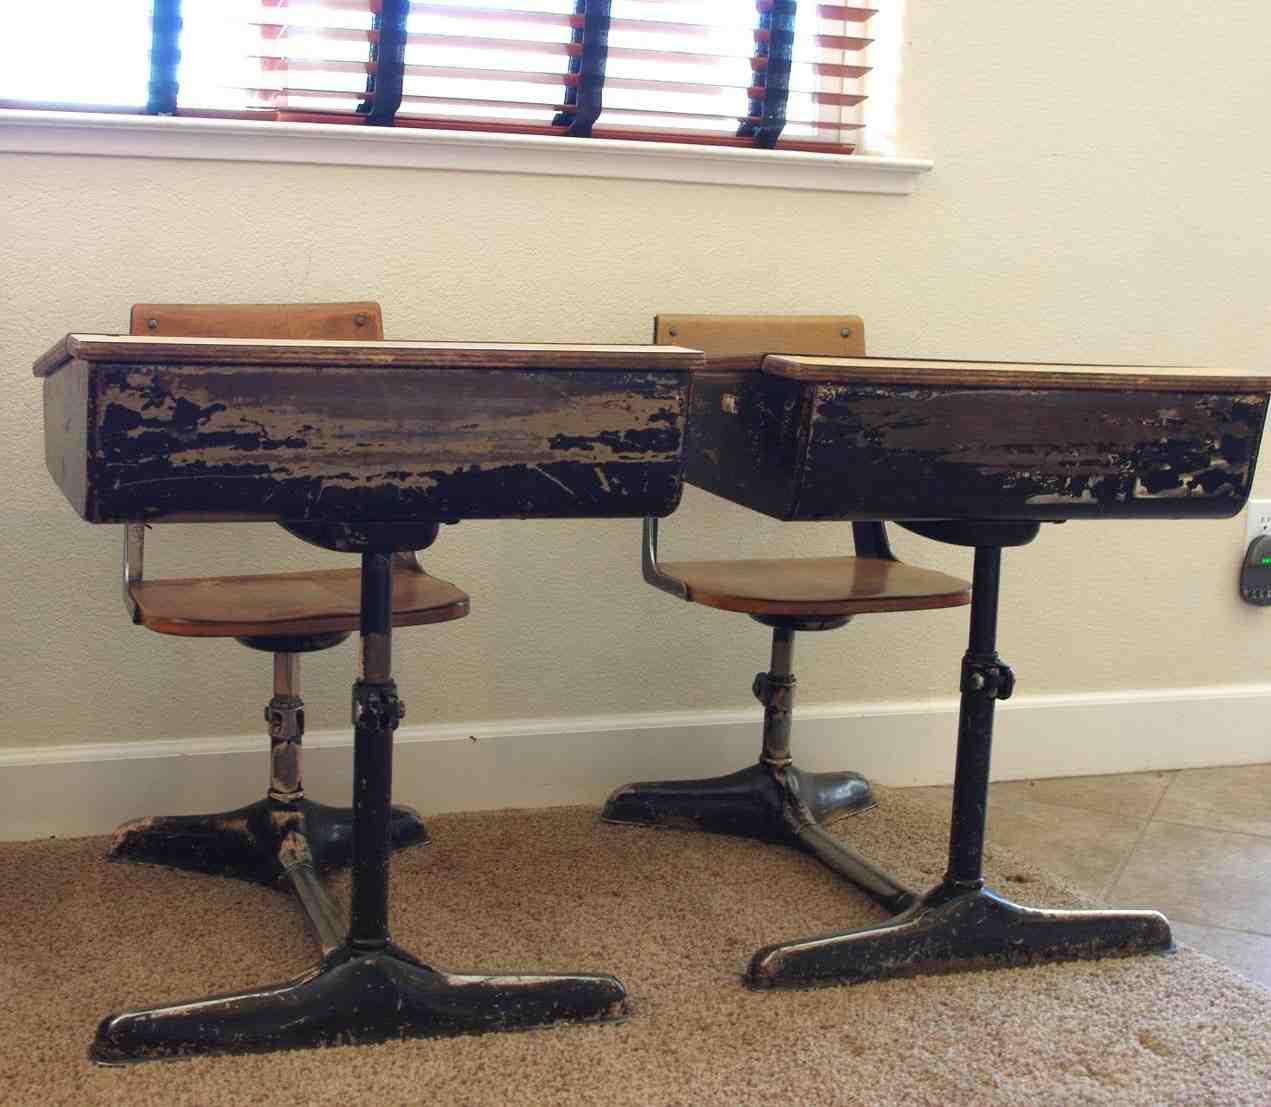 Old Fashioned Furniture For Sale: Old Fashioned School Desks For Sale